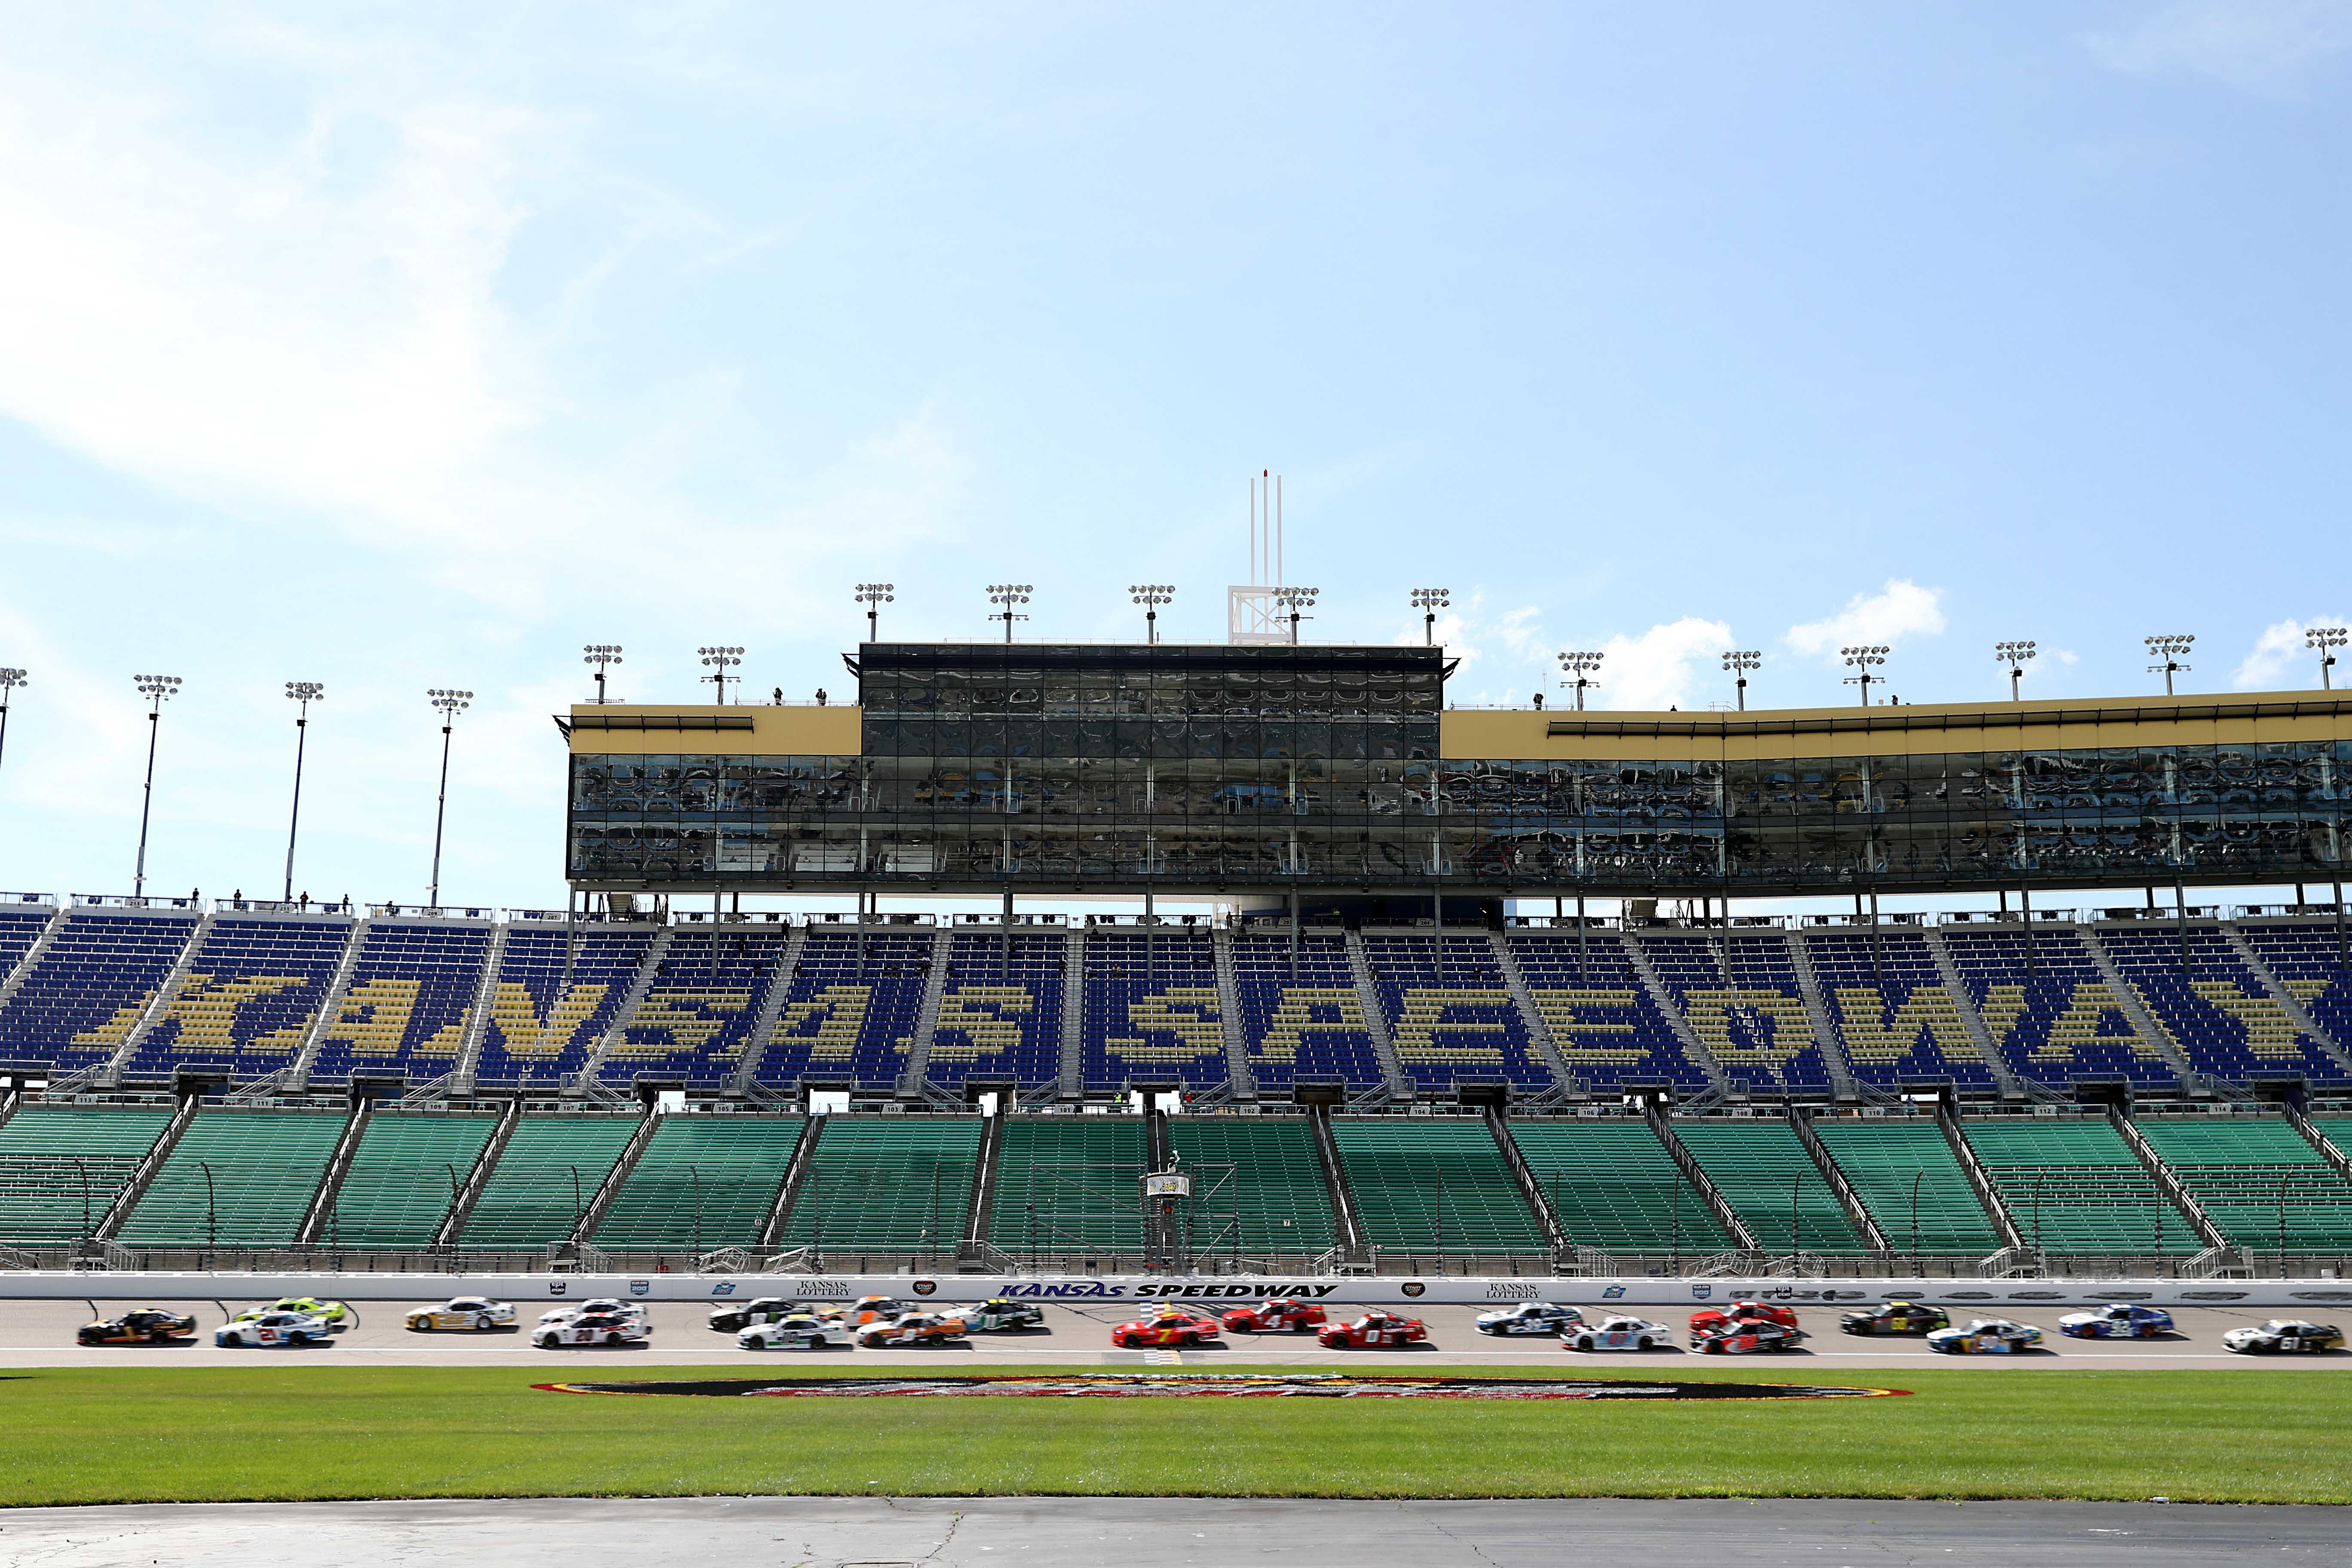 NASCAR Xfinity Series at Kansas Speedway